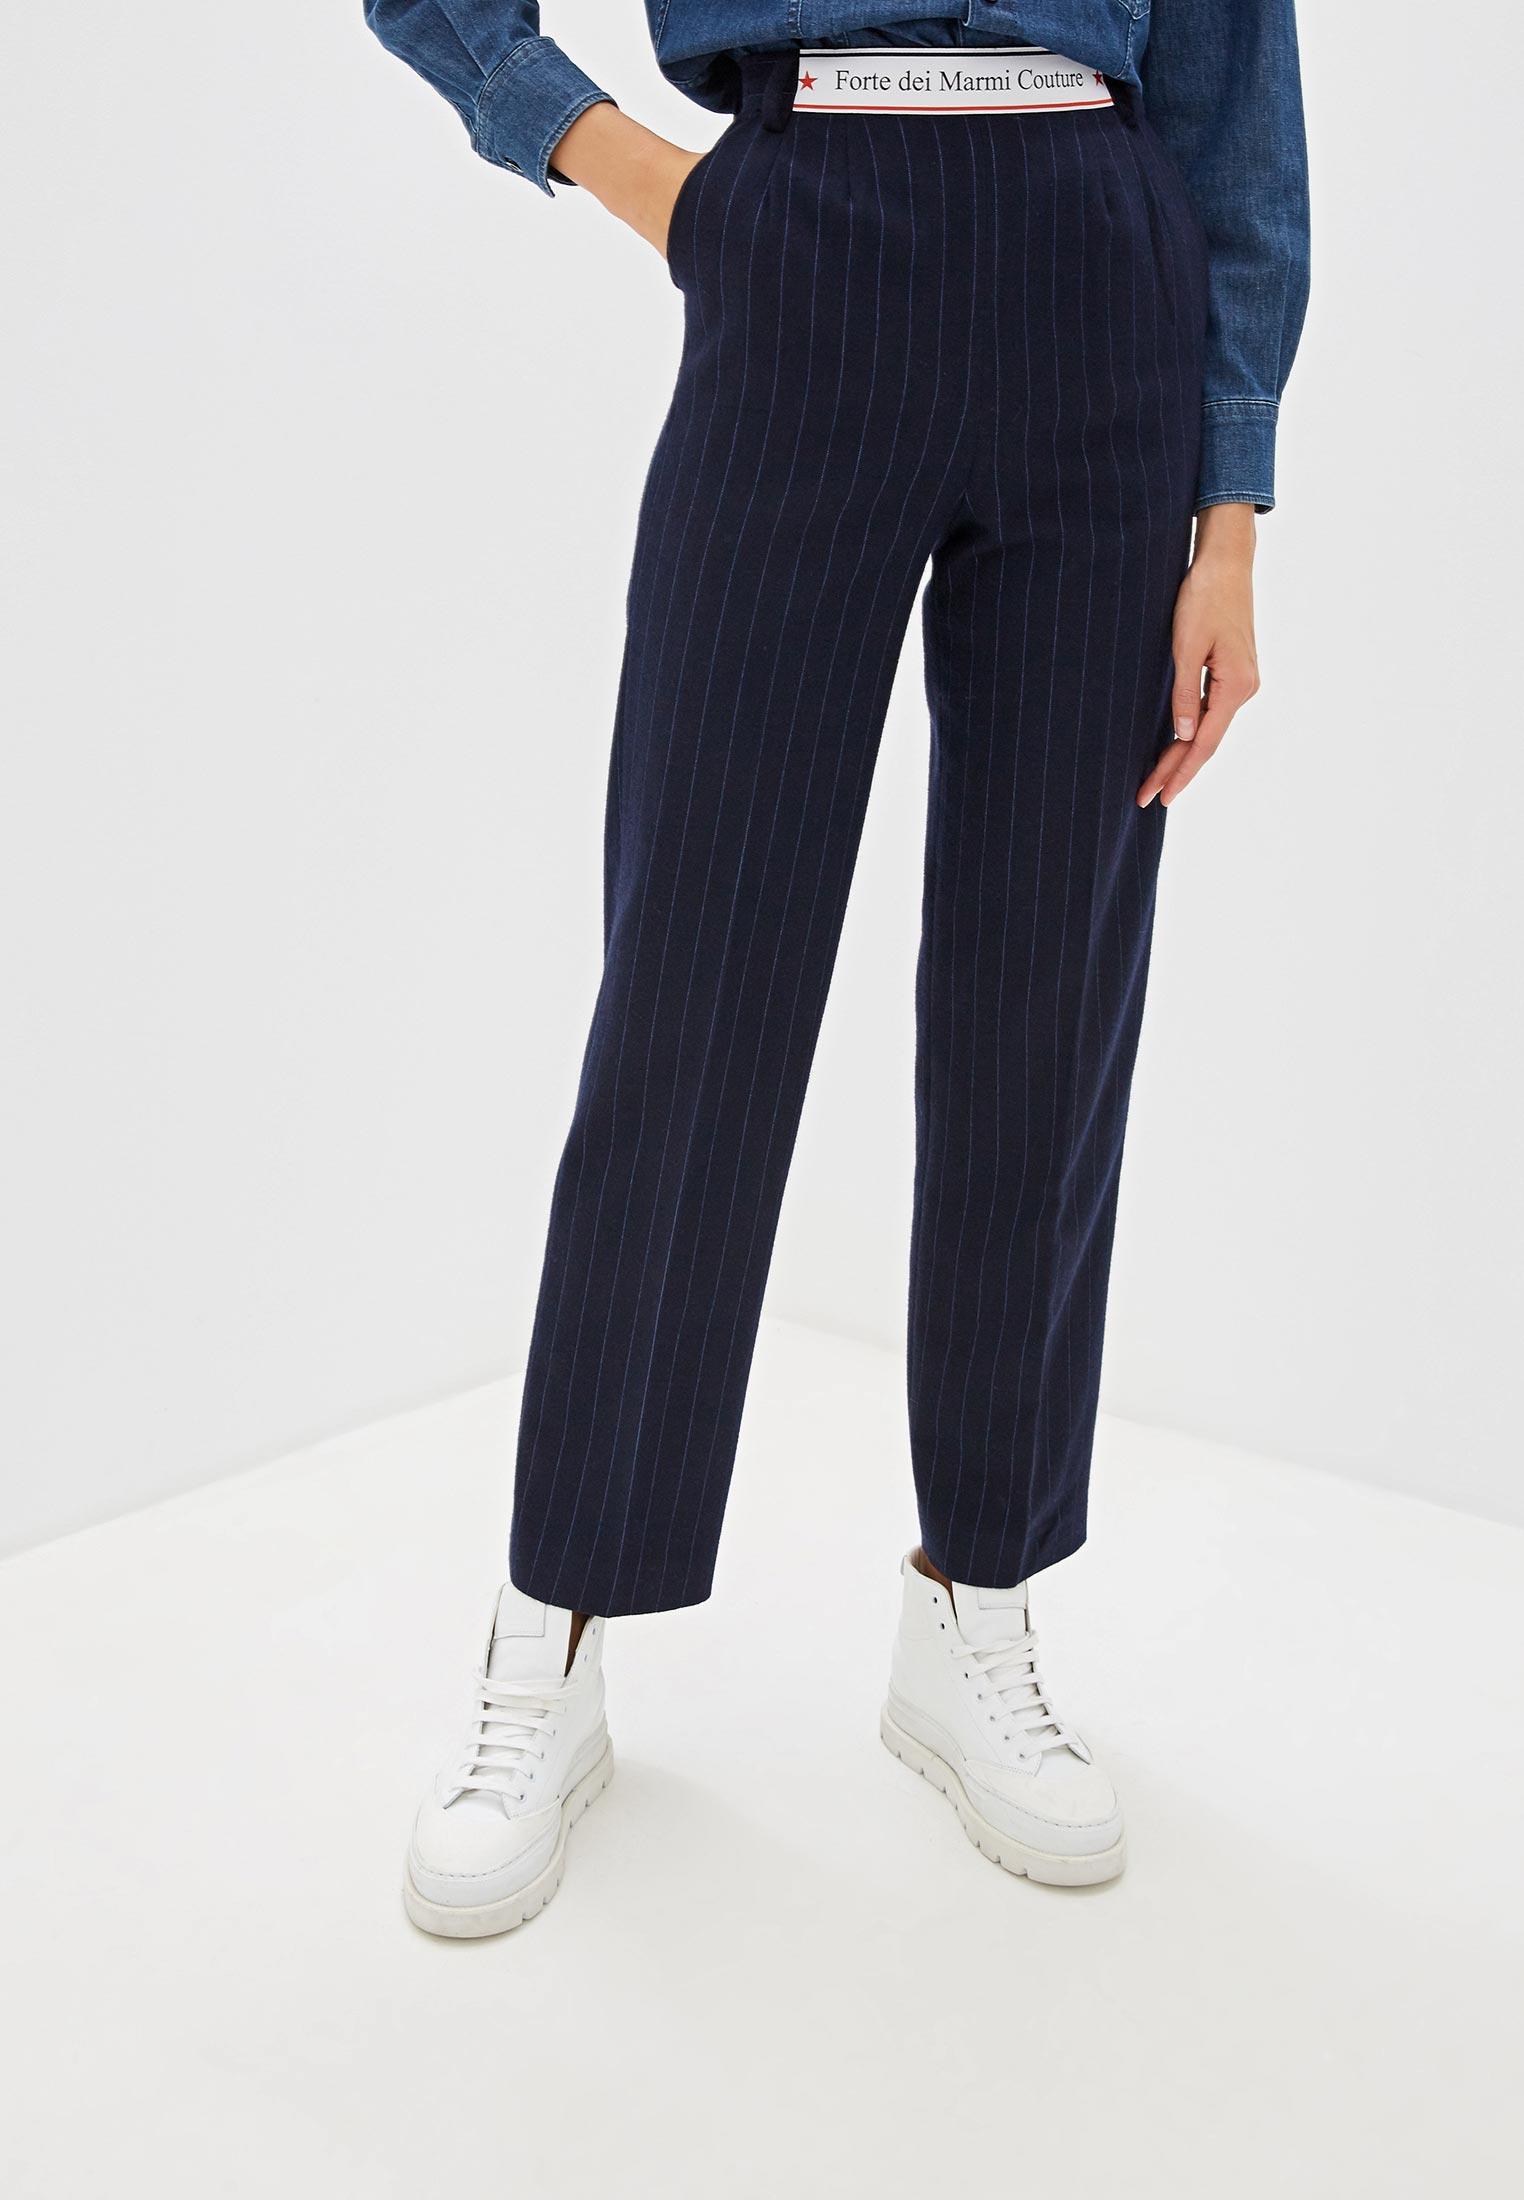 Женские классические брюки Forte Dei Marmi Couture FFW19-1002